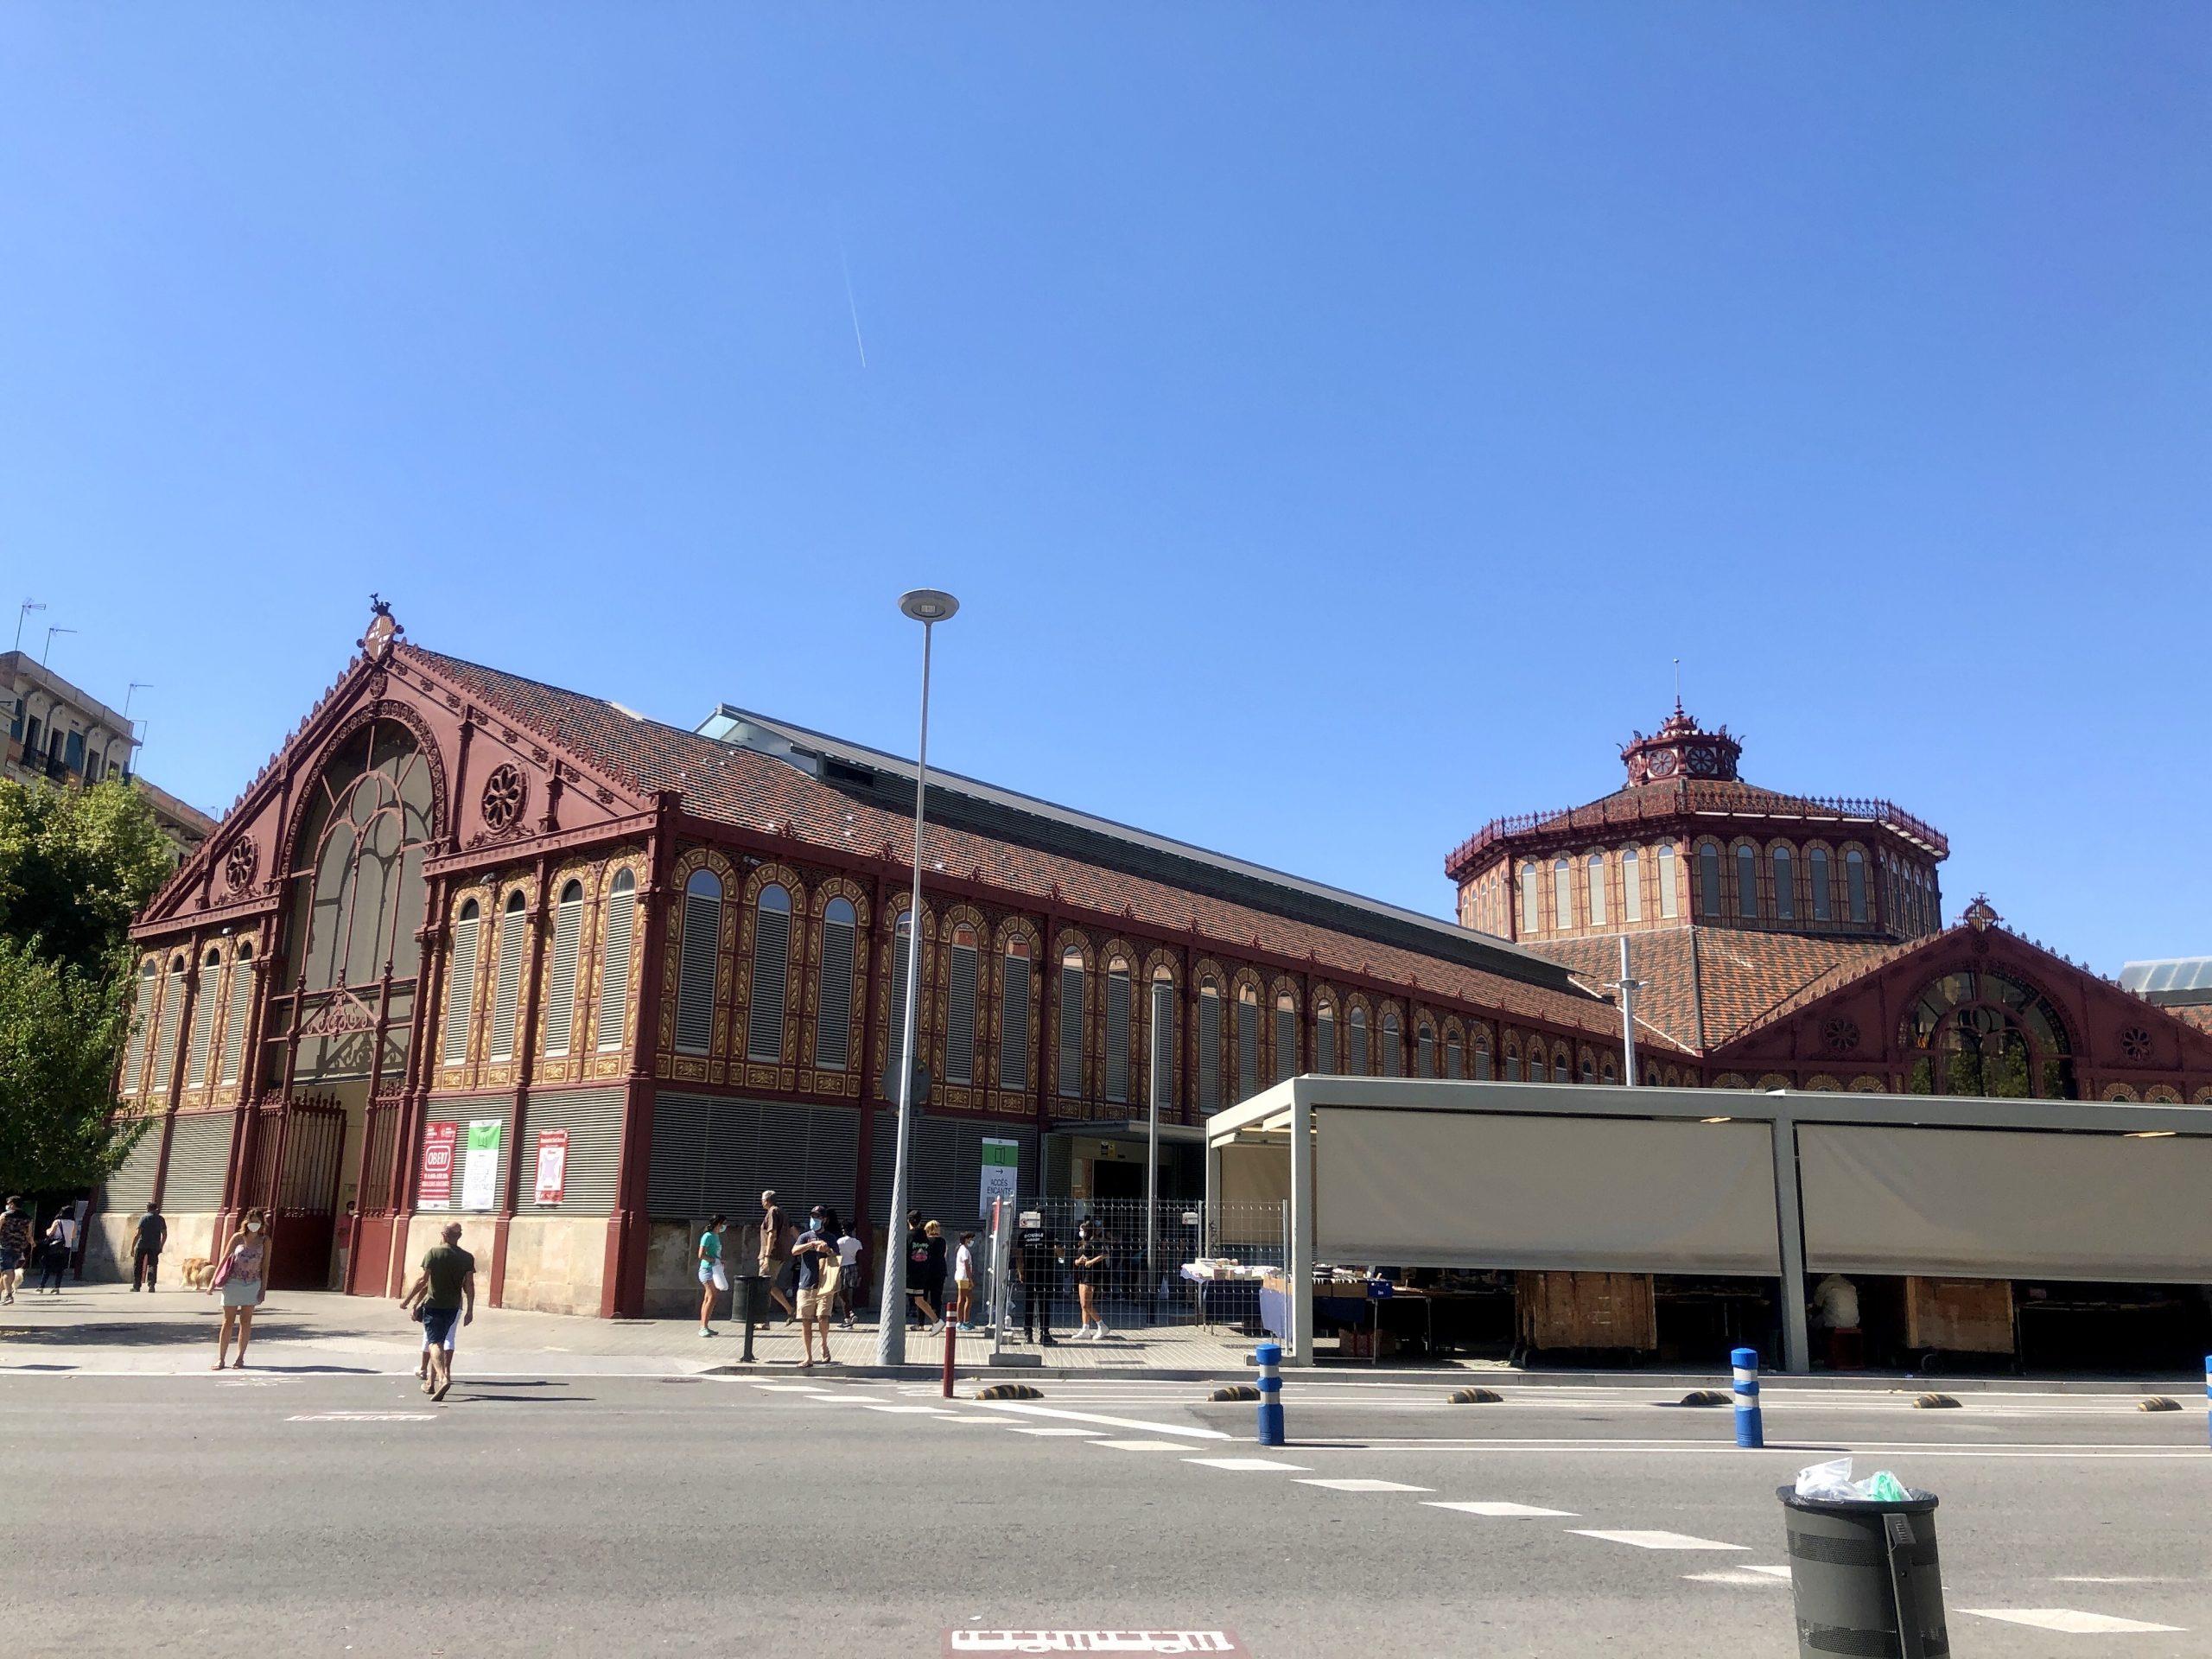 Mercat de Sant Antoni Barcelona